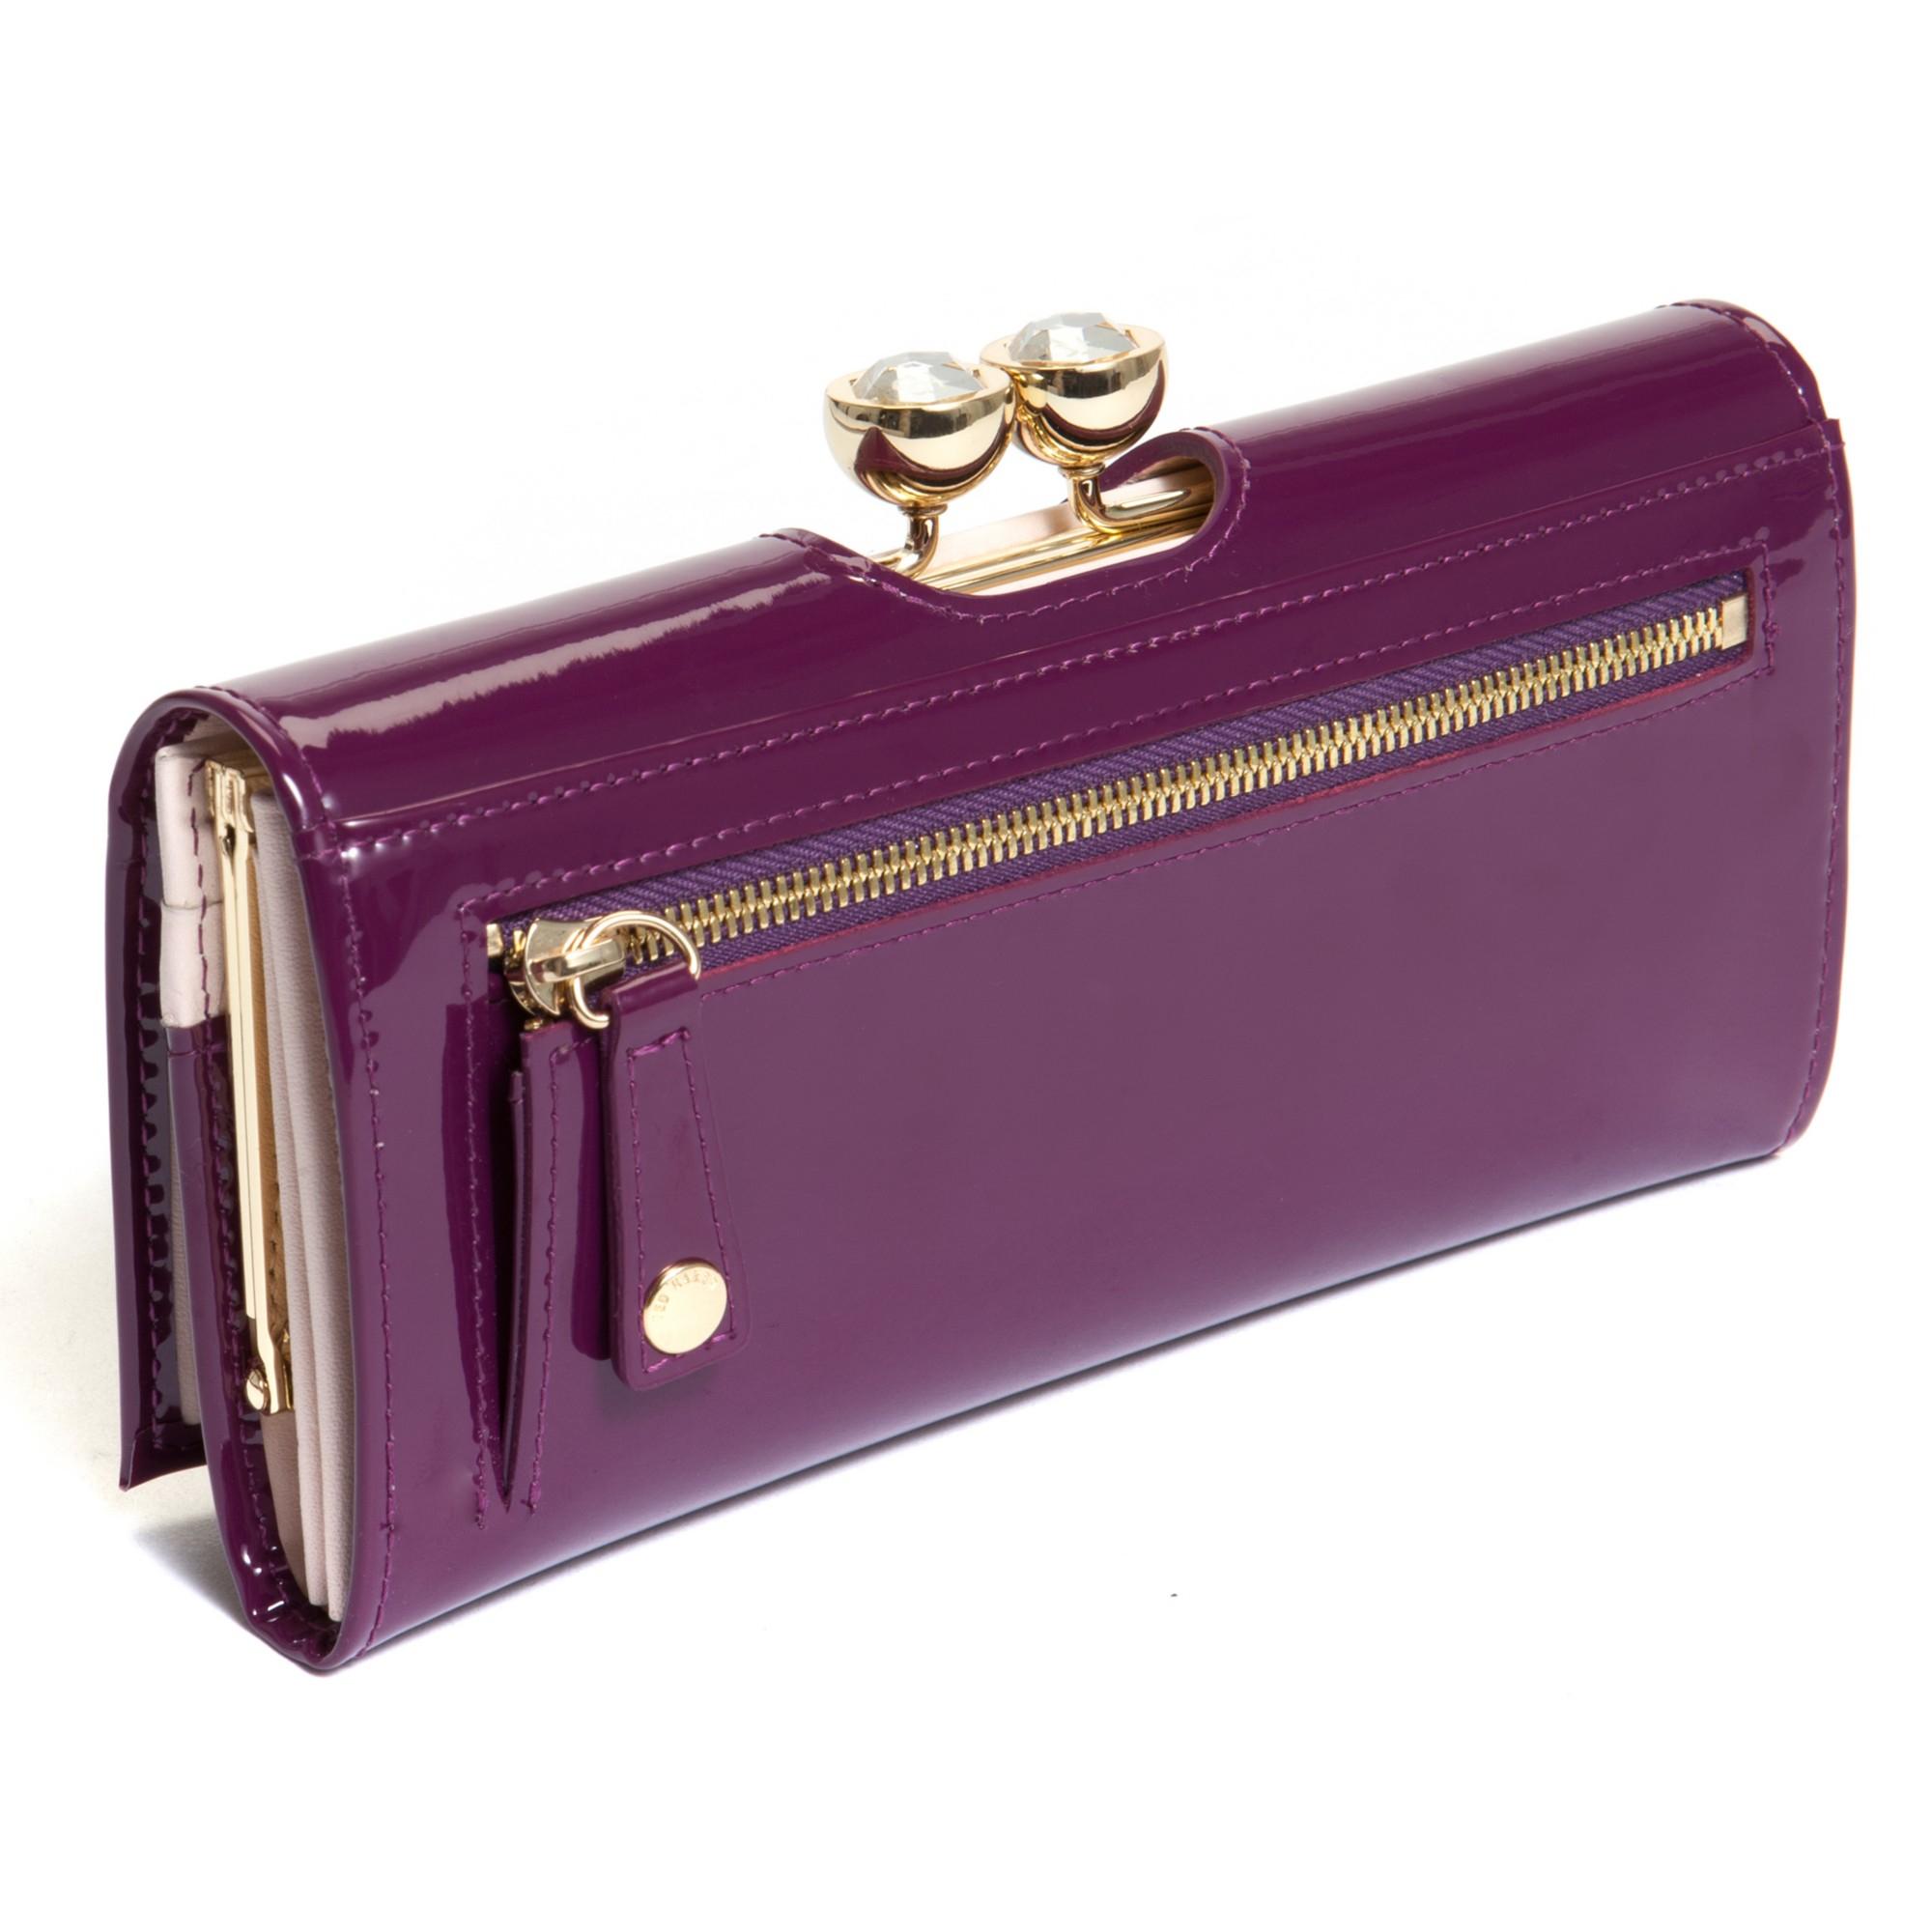 027c3b2e5b46 Ted Baker Kassady Crystal Bobble Leather Matinee Purse in Purple - Lyst